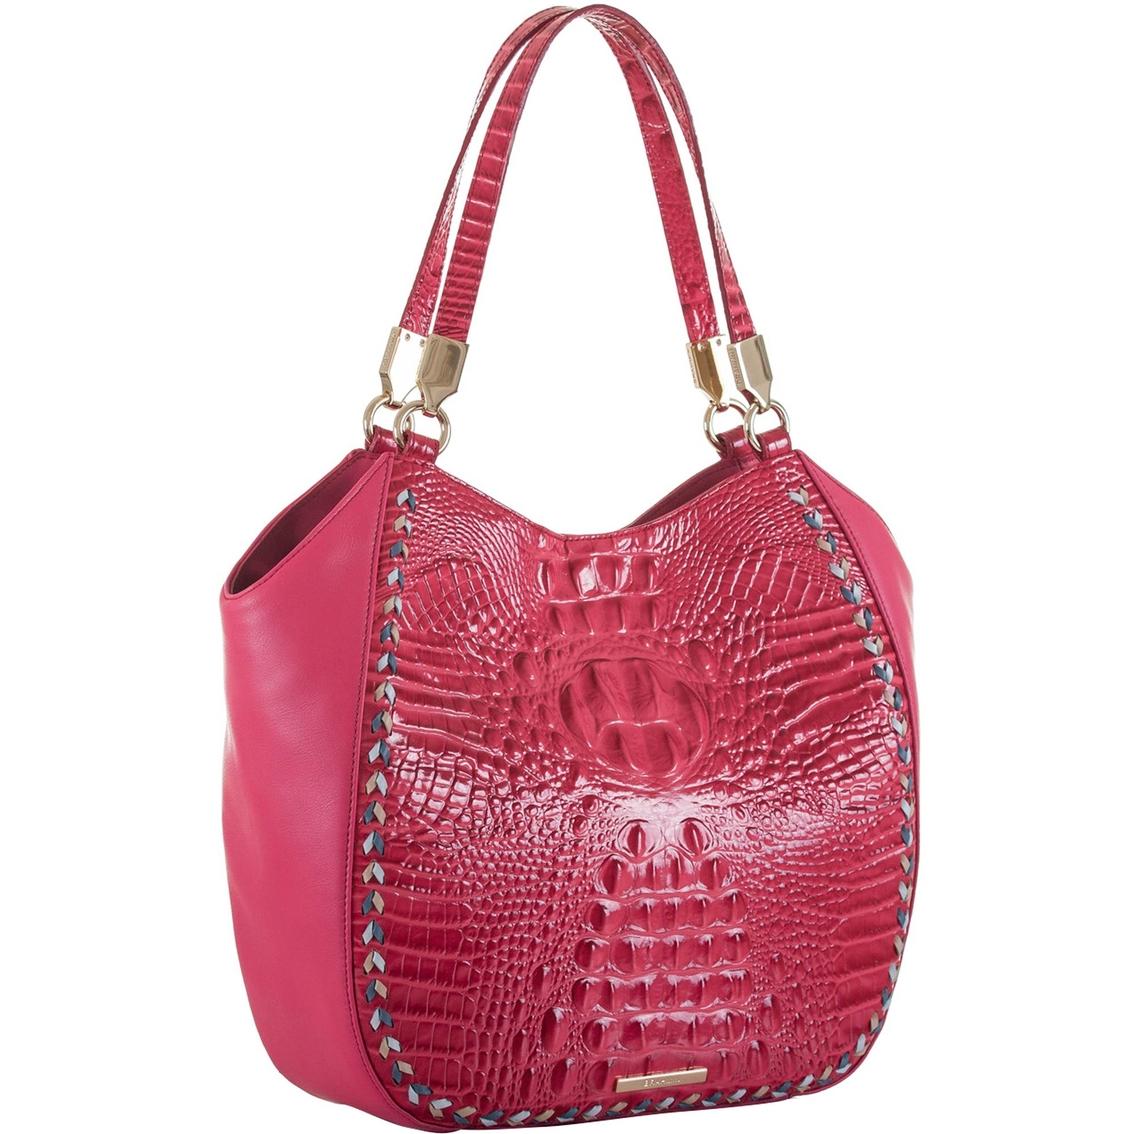 Brahmin Marianna (Ribbon) Handbags roqbkuhXOx